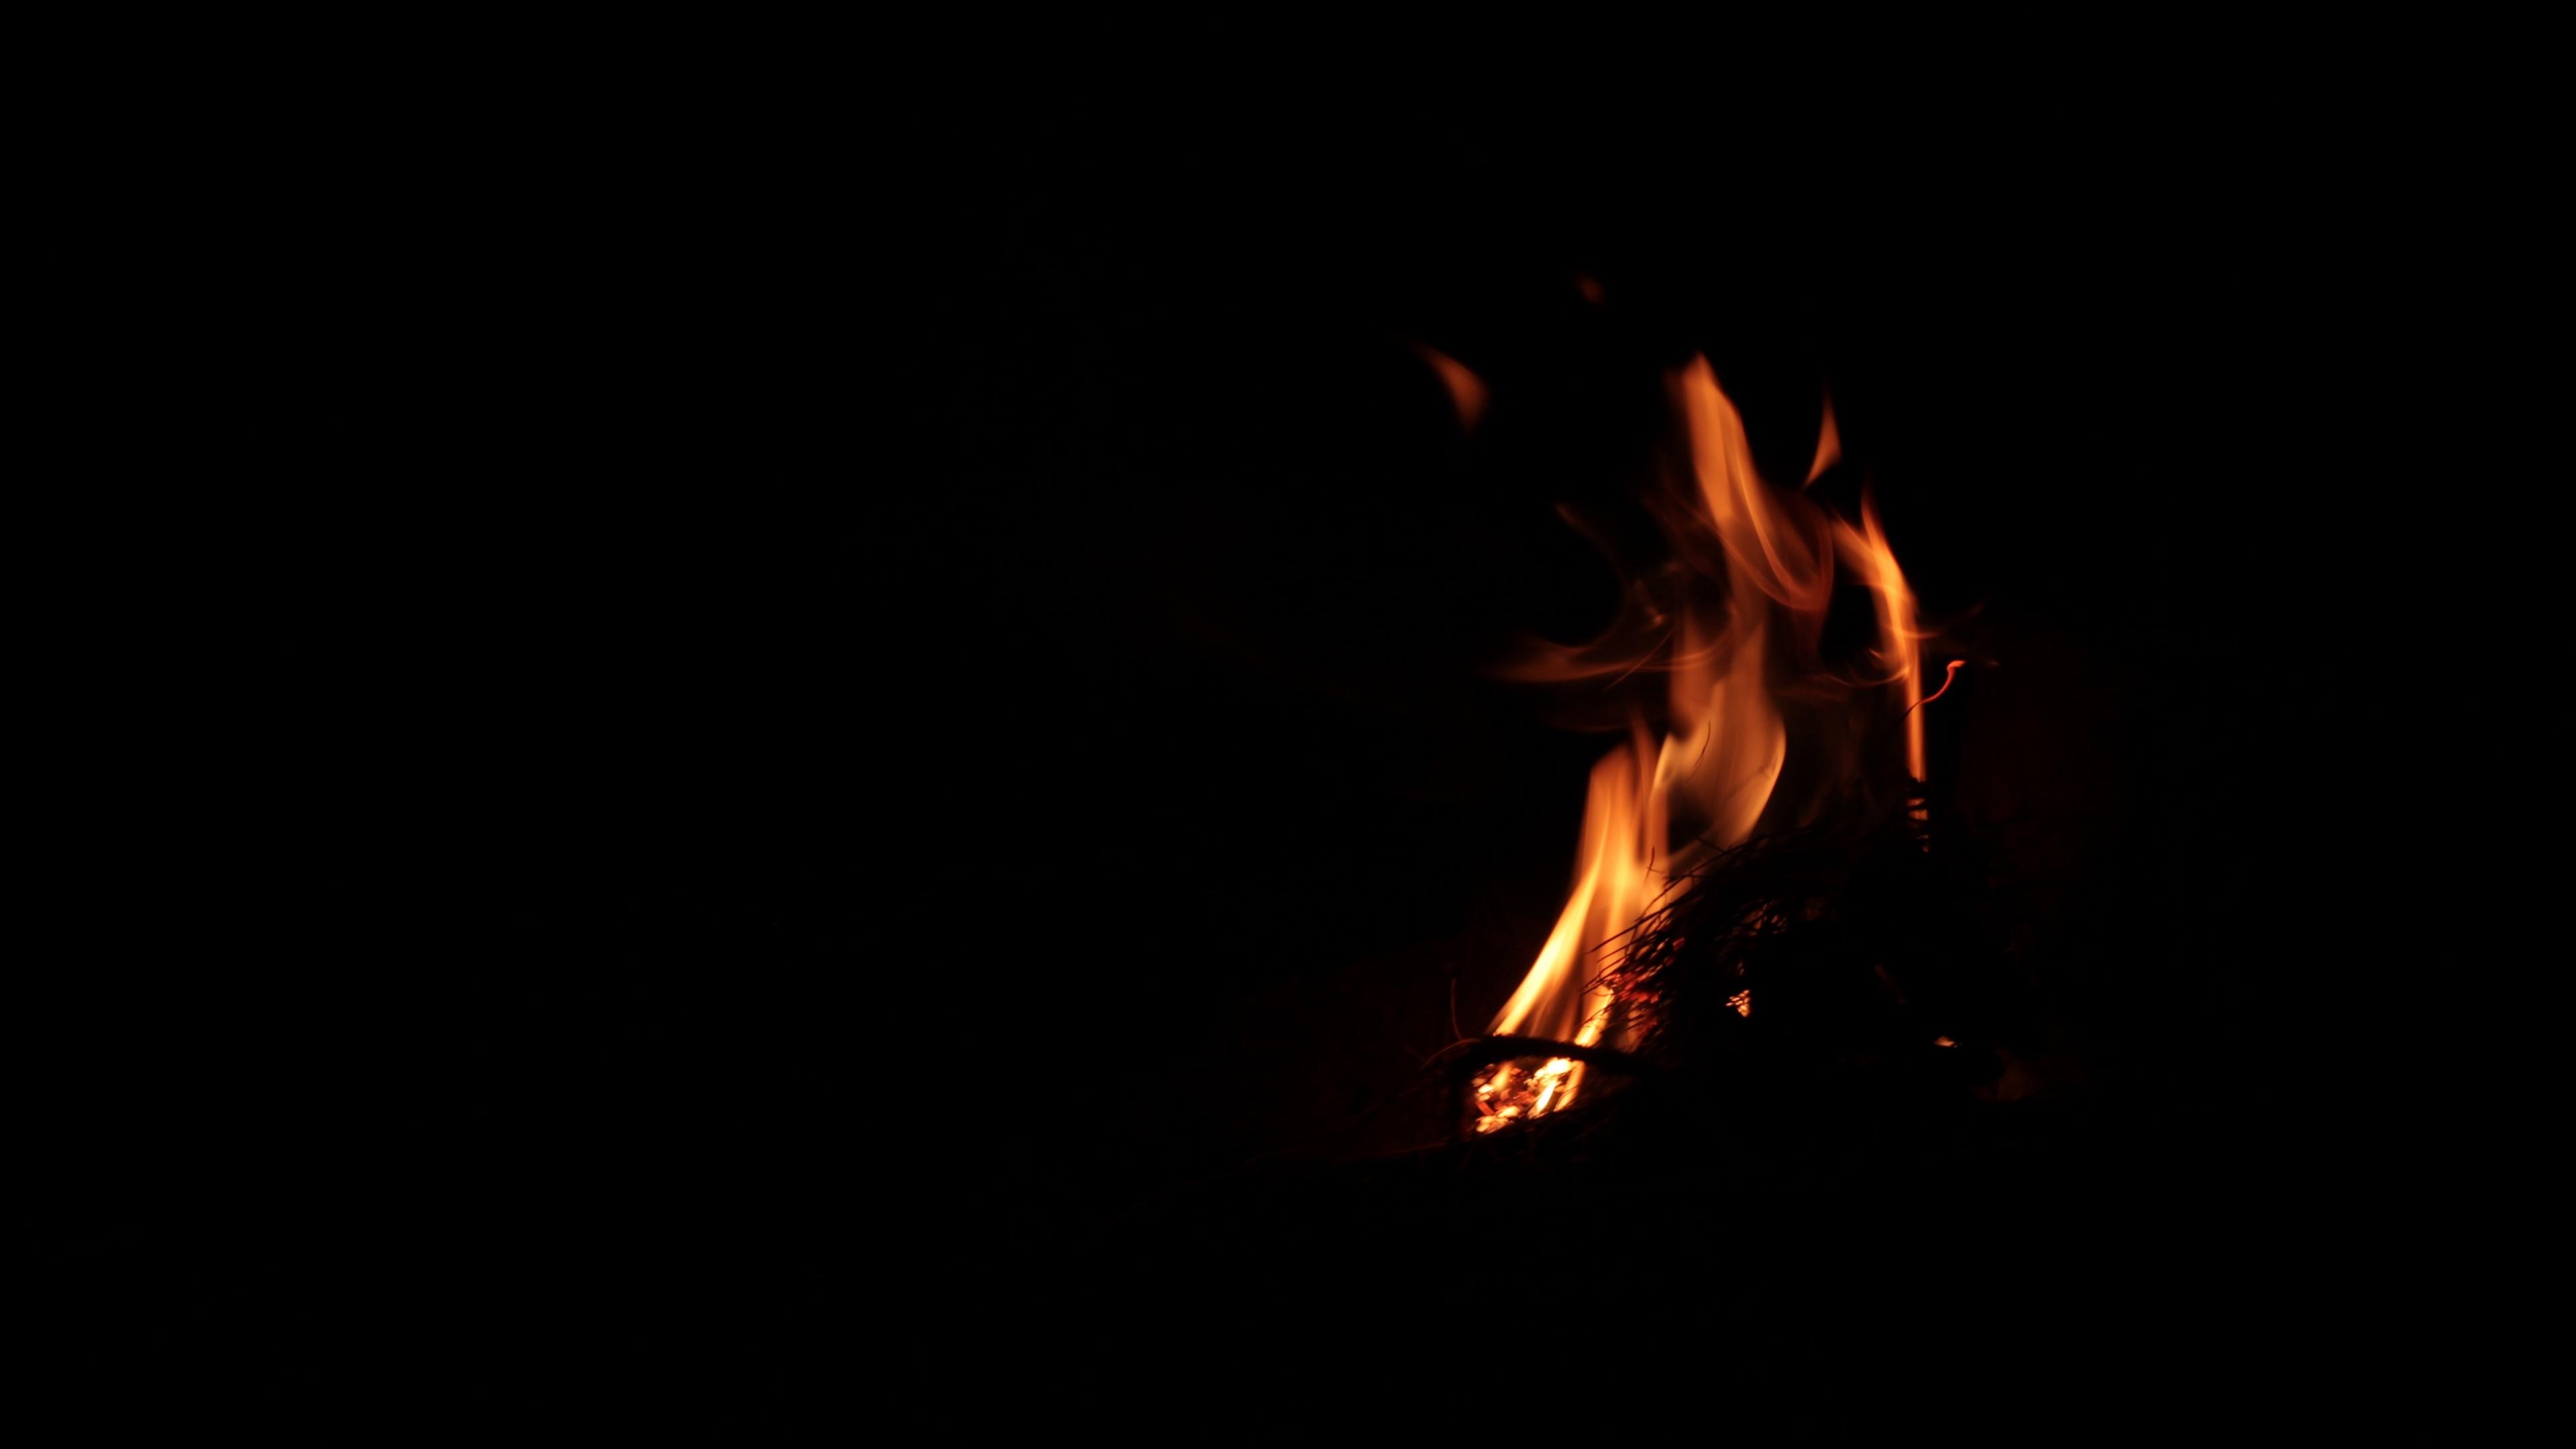 bonfire fire dark flame 4k 1540575167 - bonfire, fire, dark, flame 4k - Fire, Dark, bonfire